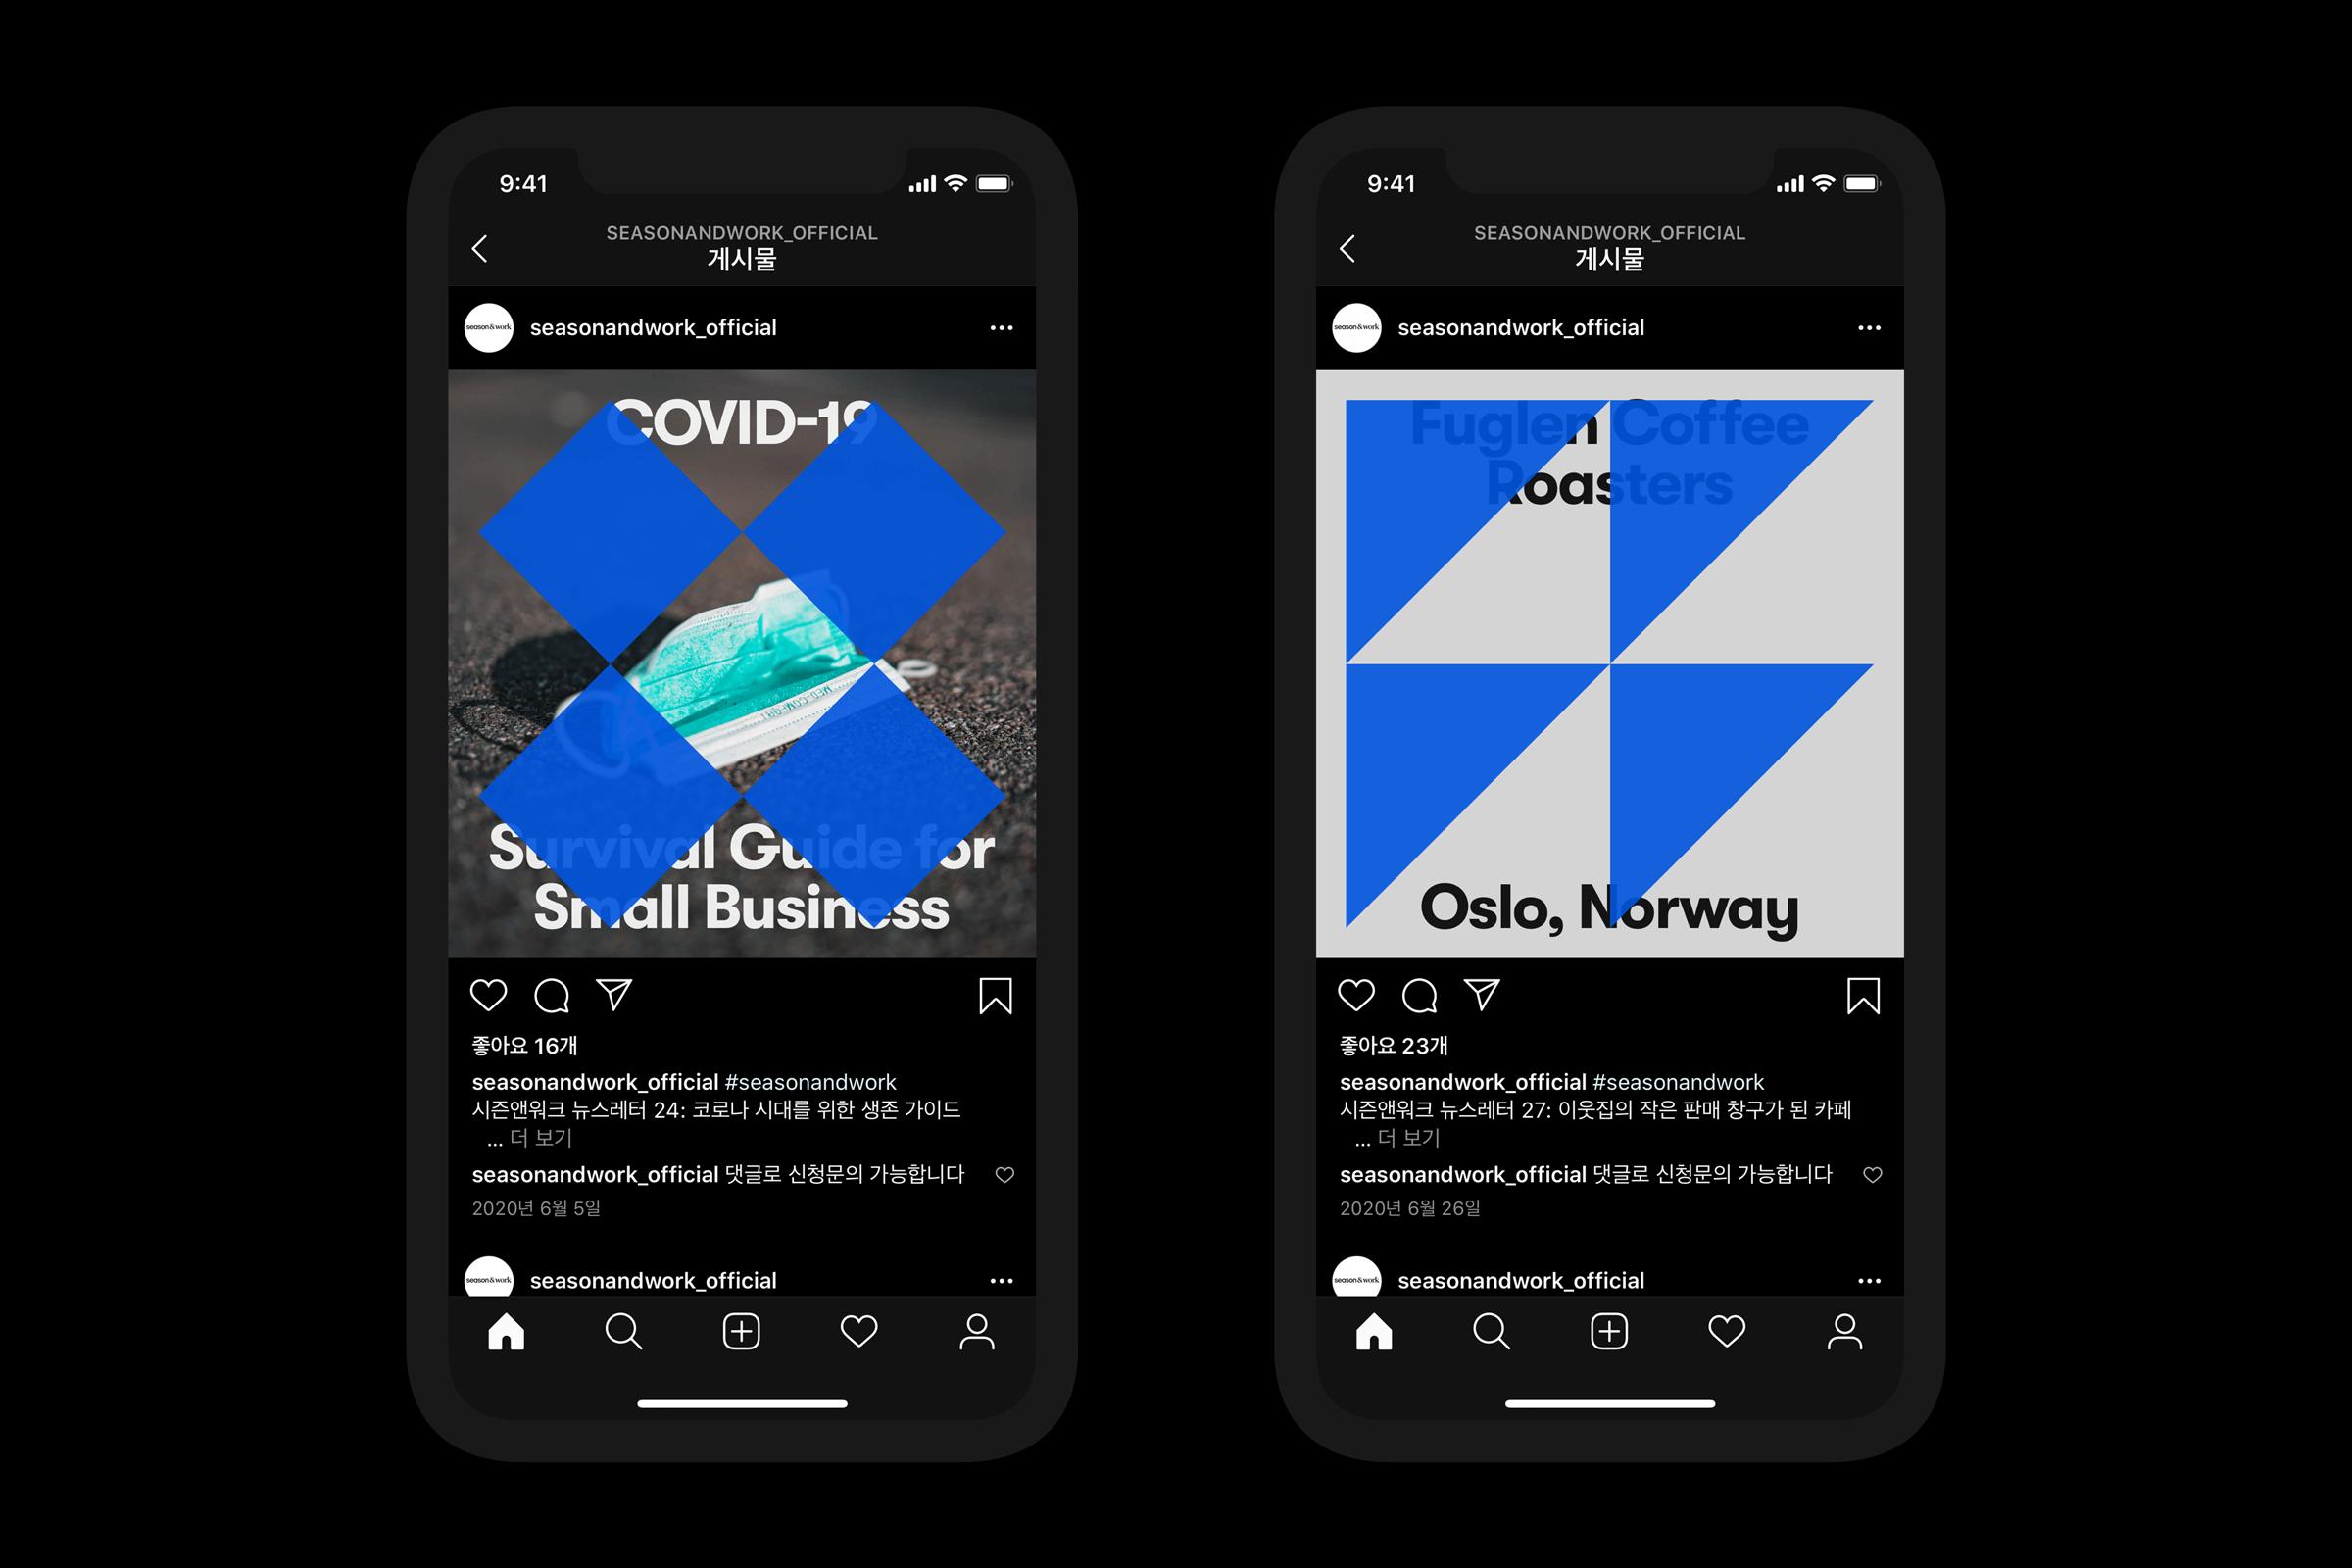 ClubCombiPhoneXmockup01